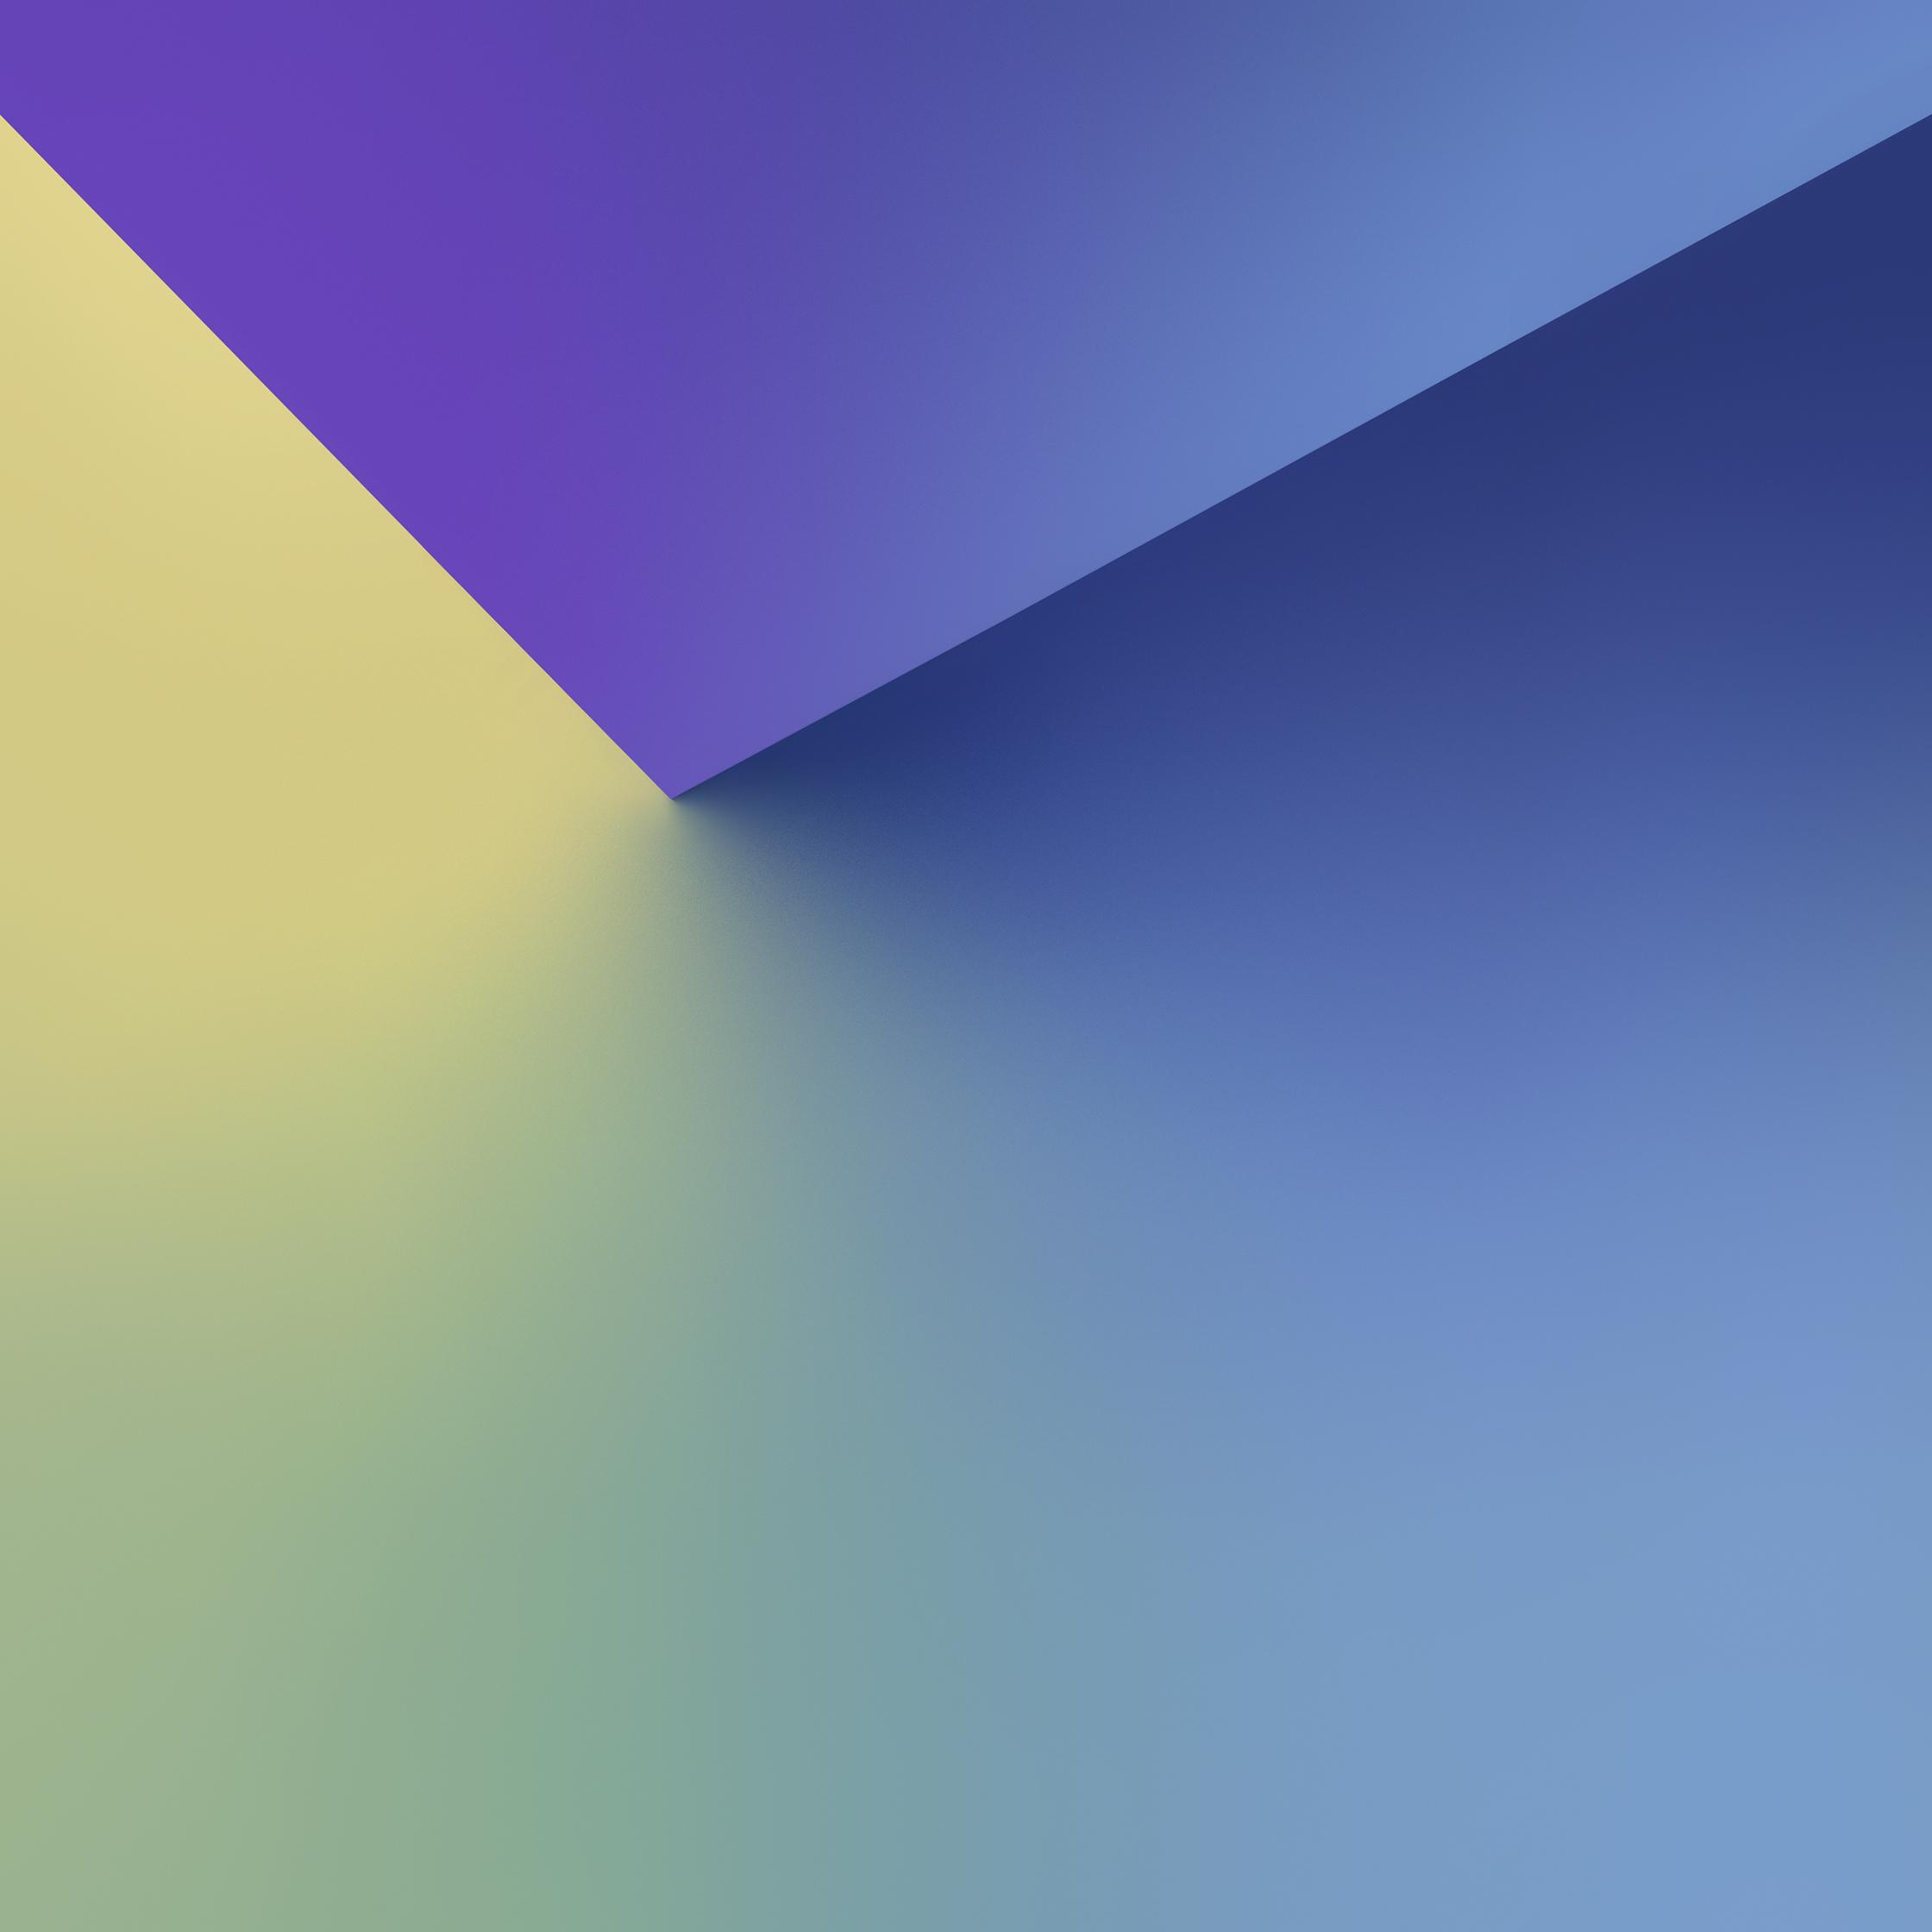 28 Samsung Galaxy Note 7 Wallpapers On Wallpapersafari